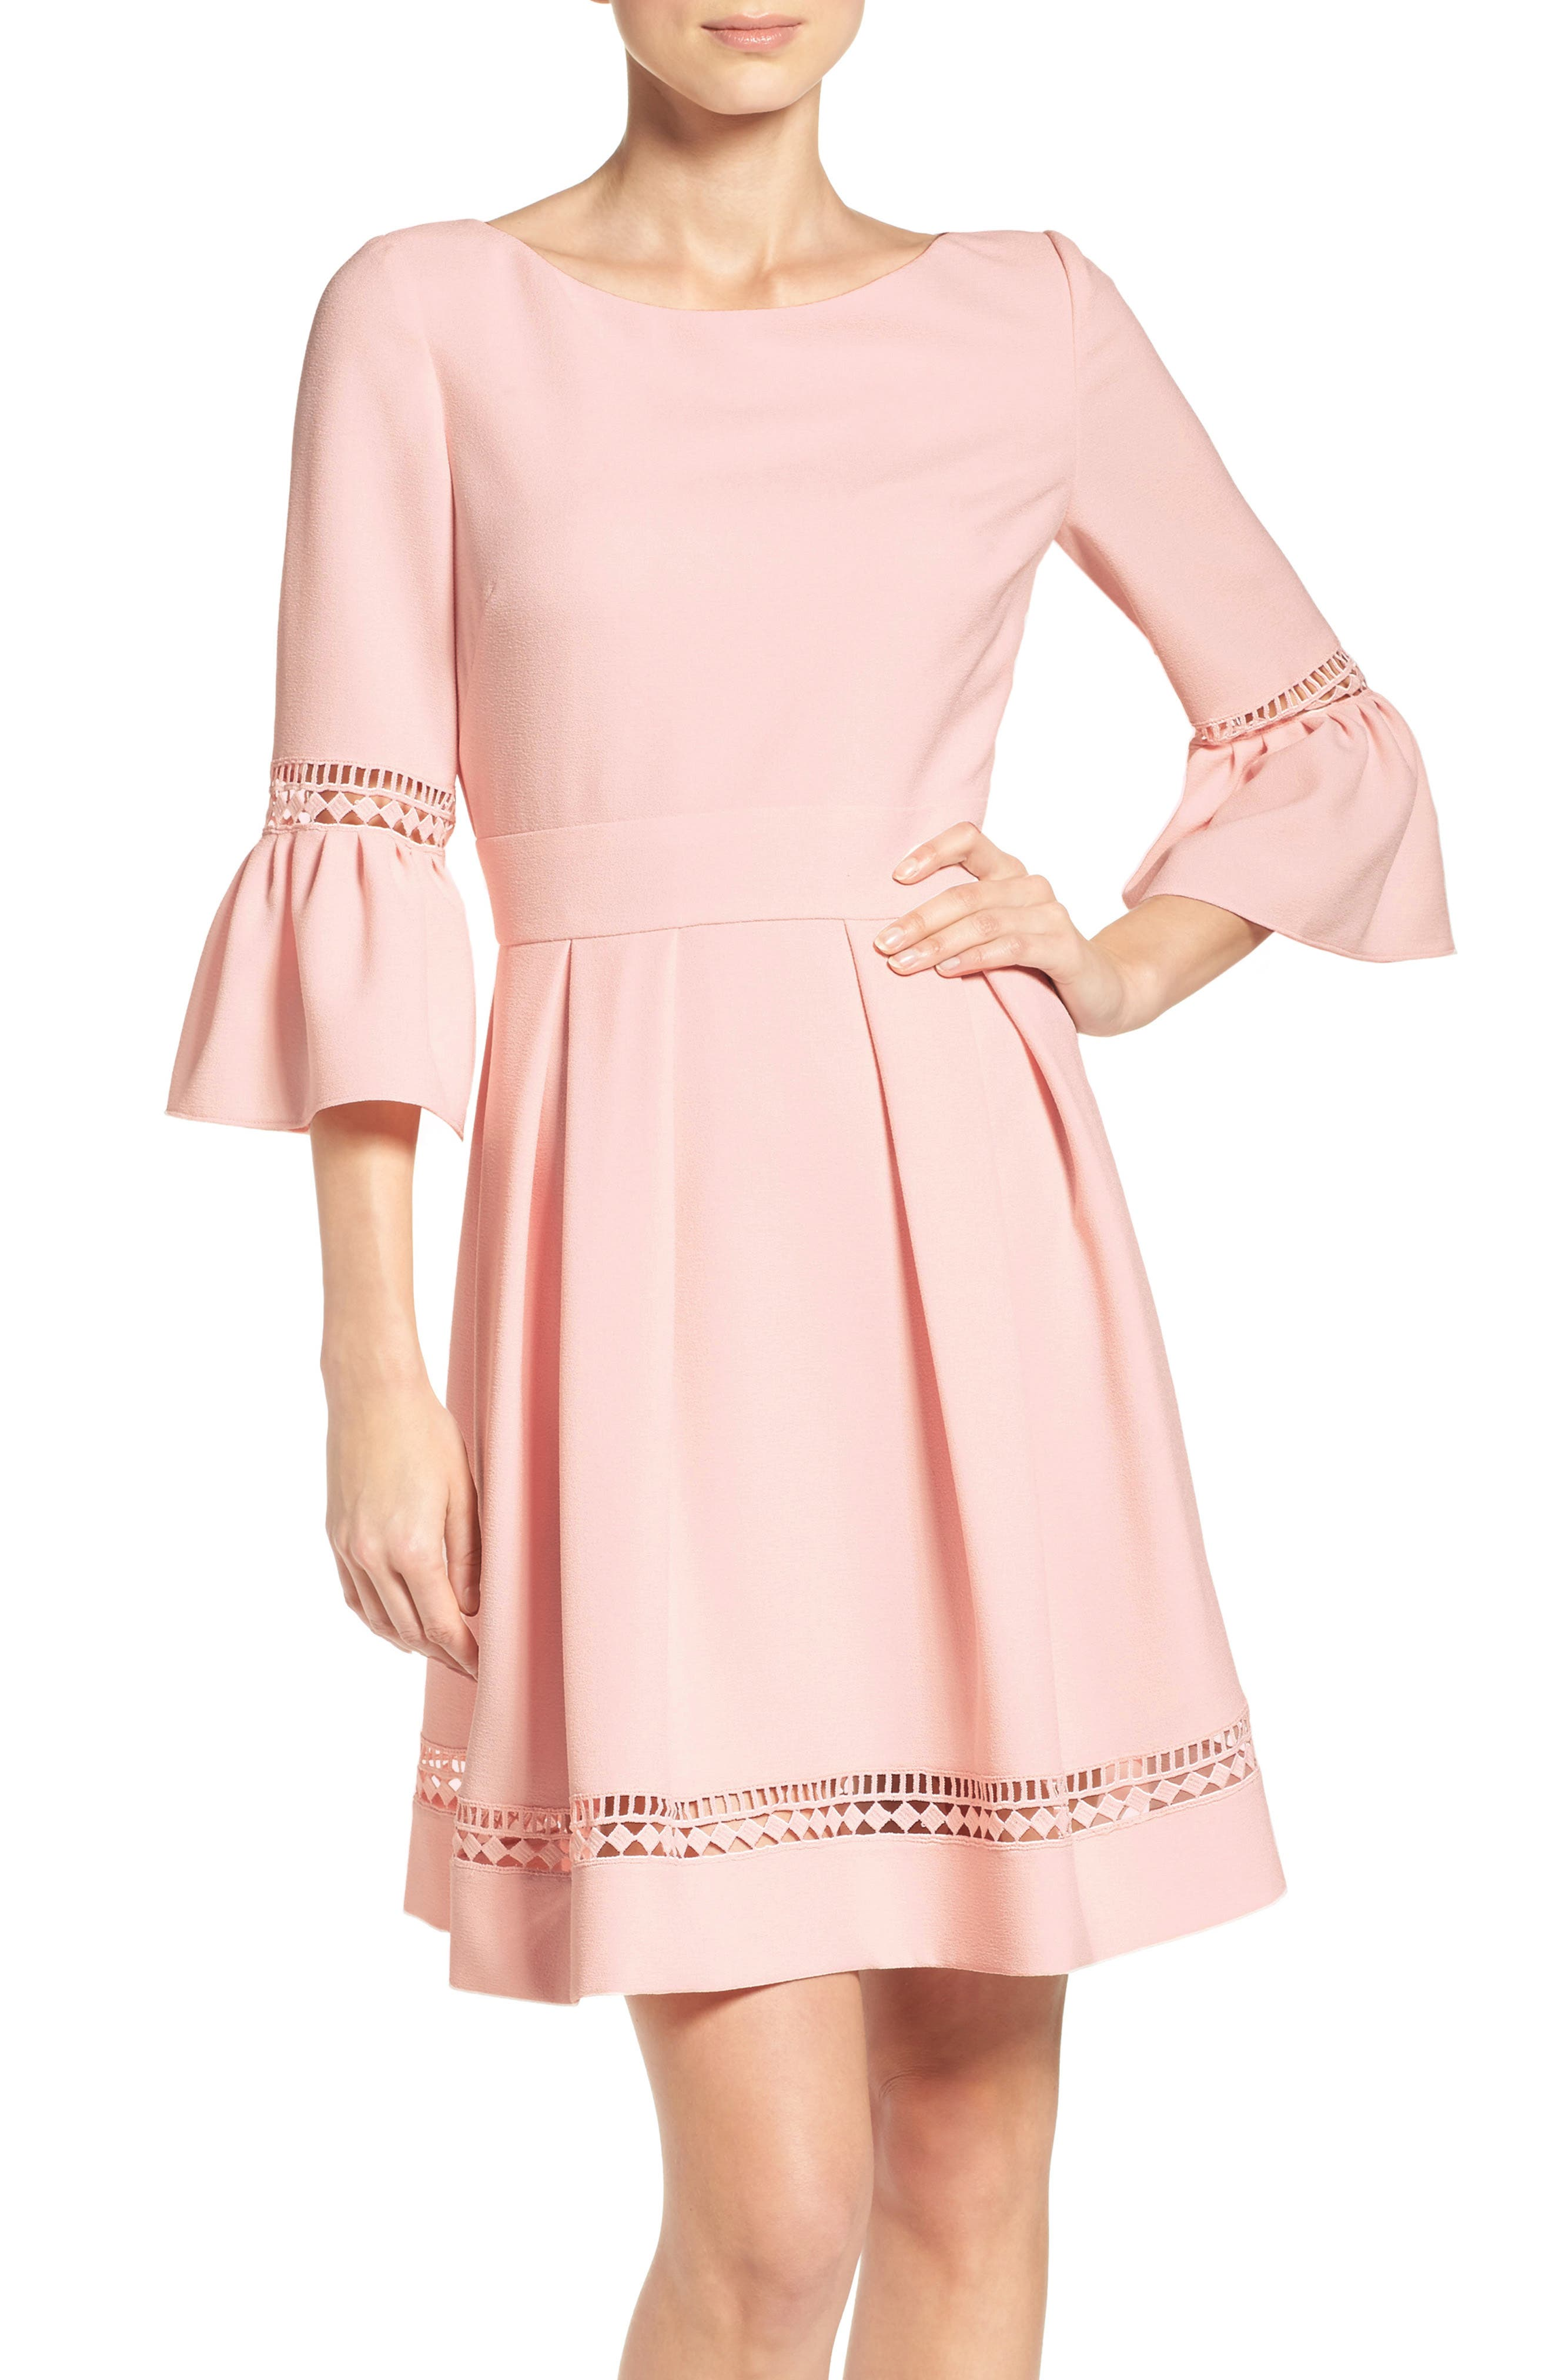 ELIZA J,                             Bell Sleeve Fit & Flare Dress,                             Main thumbnail 1, color,                             BLUSH